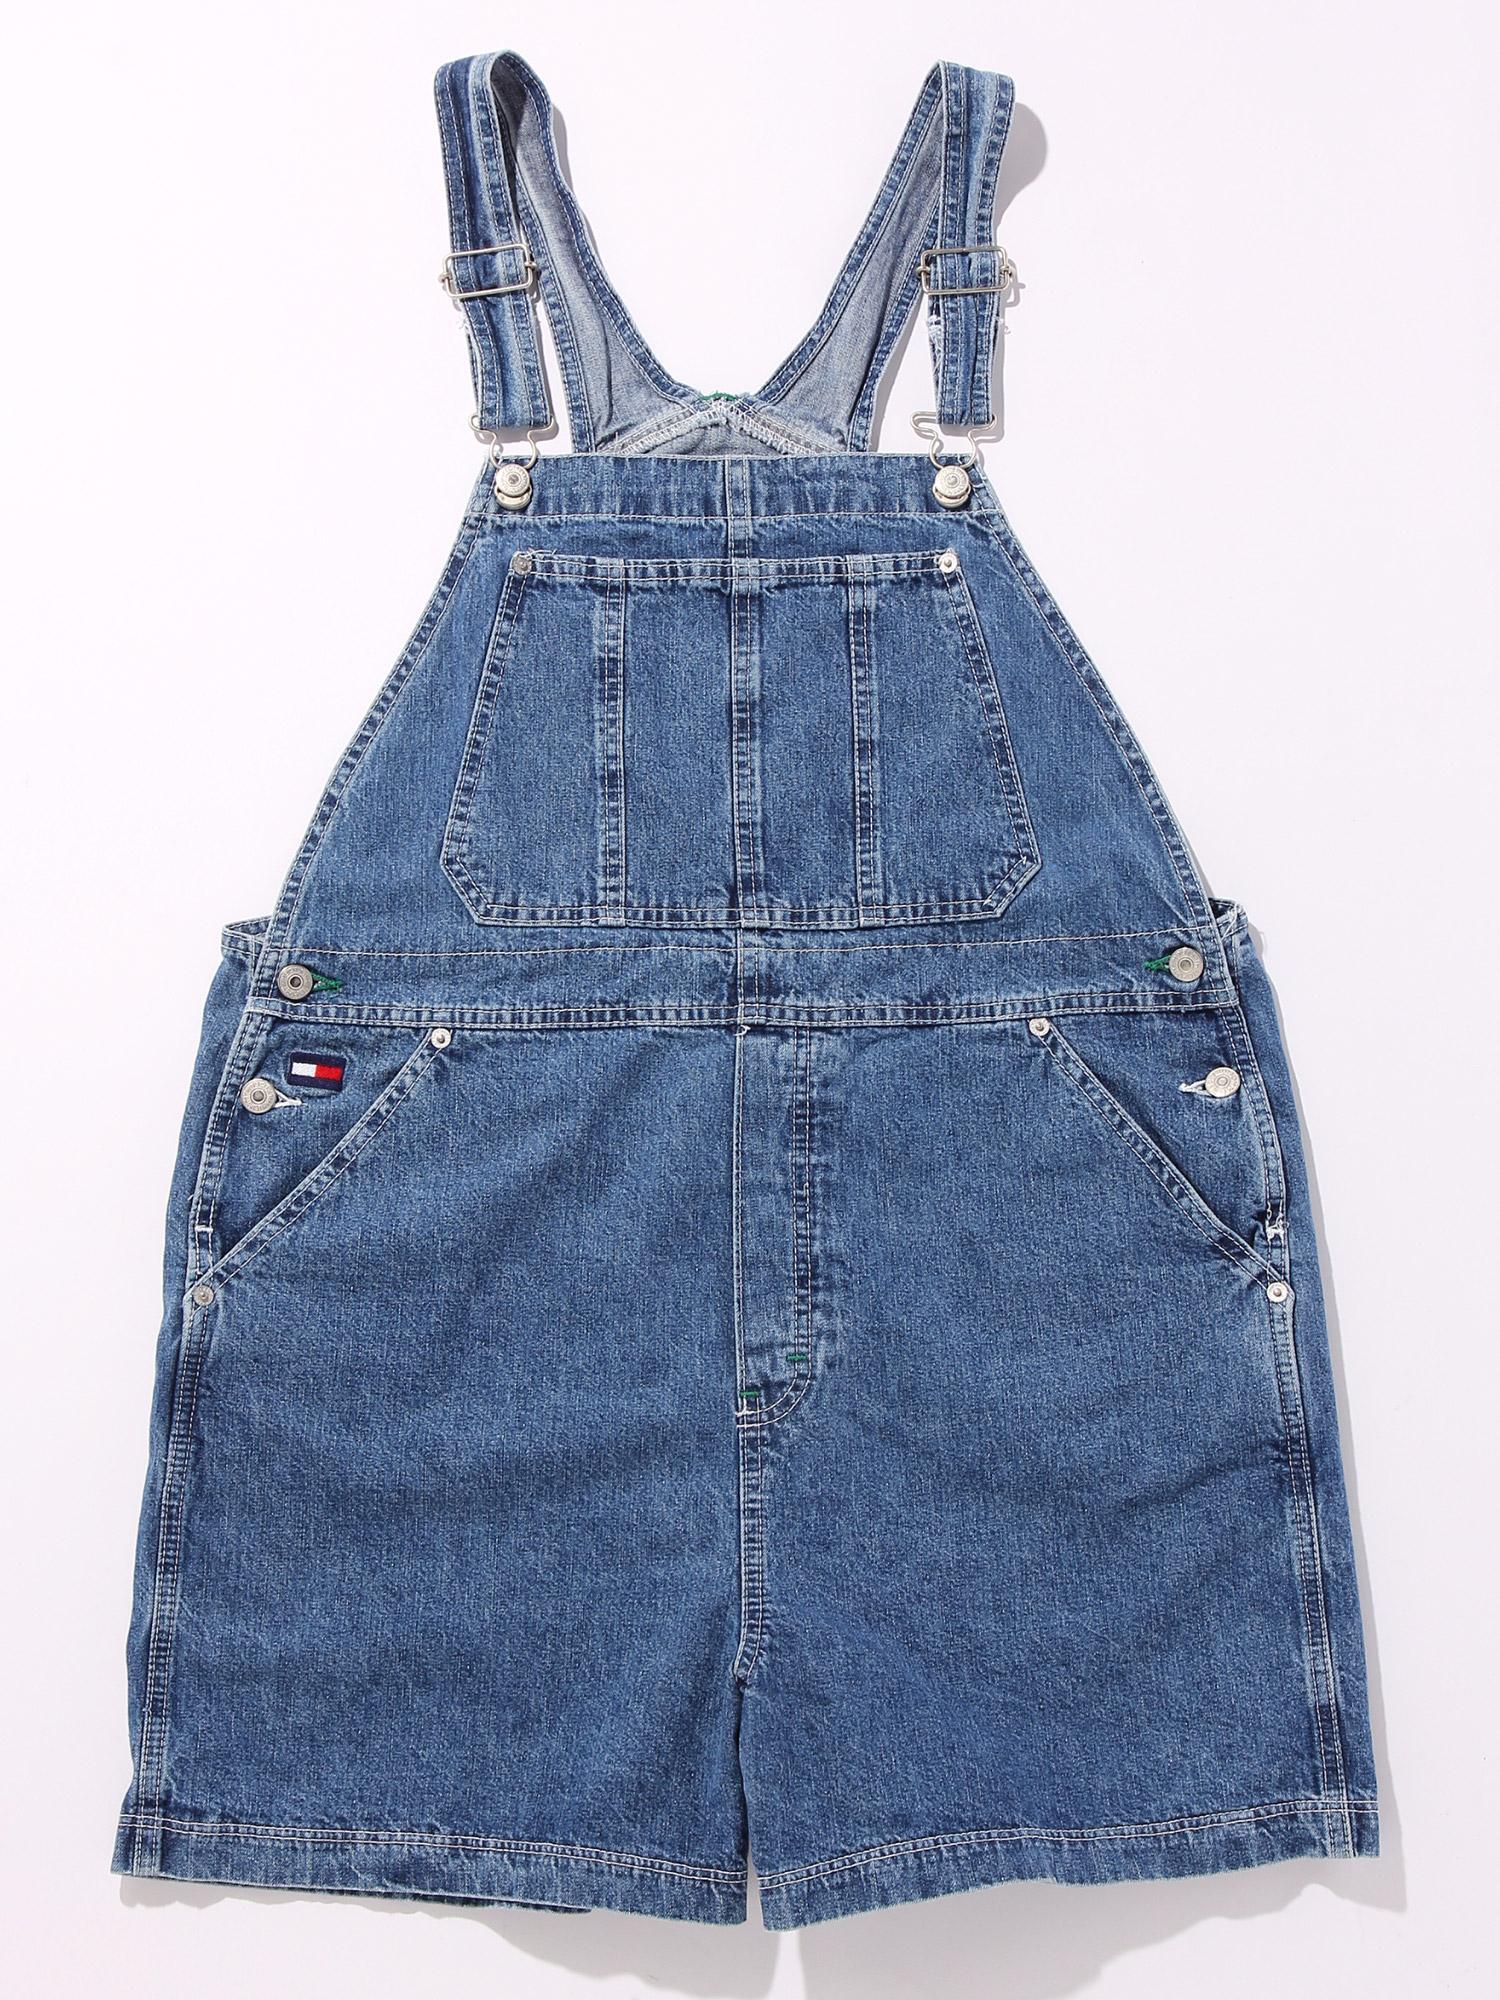 【USED】90'-00'sオーバーオールショーツTOMMYCANADAサイズ表記XL